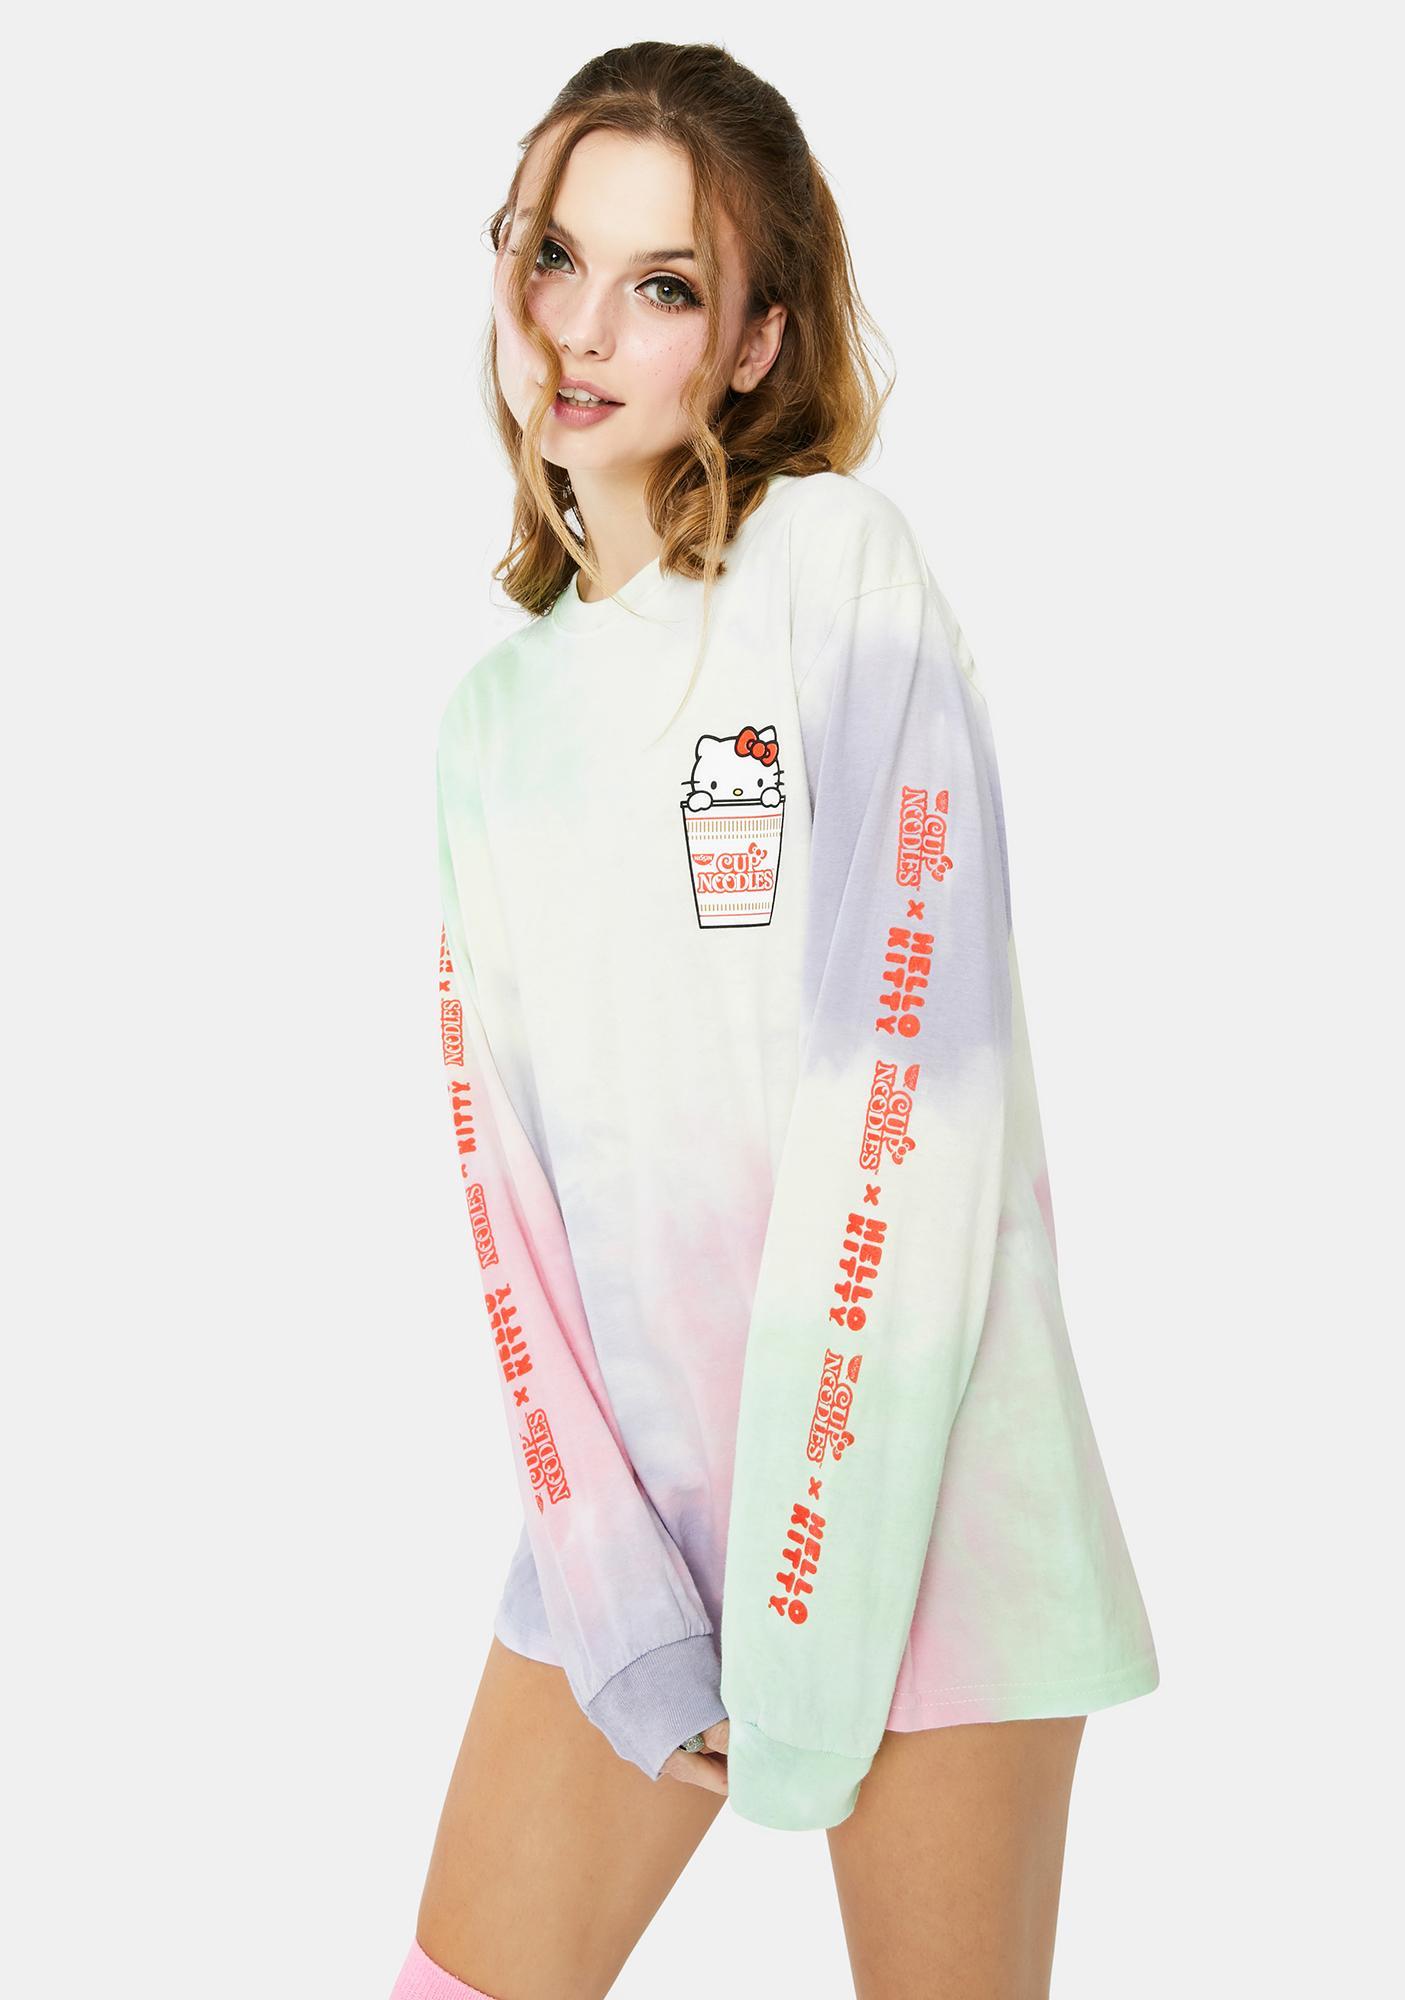 Hello Kitty x Cup Noodles Tie Dye Long Sleeve Tee